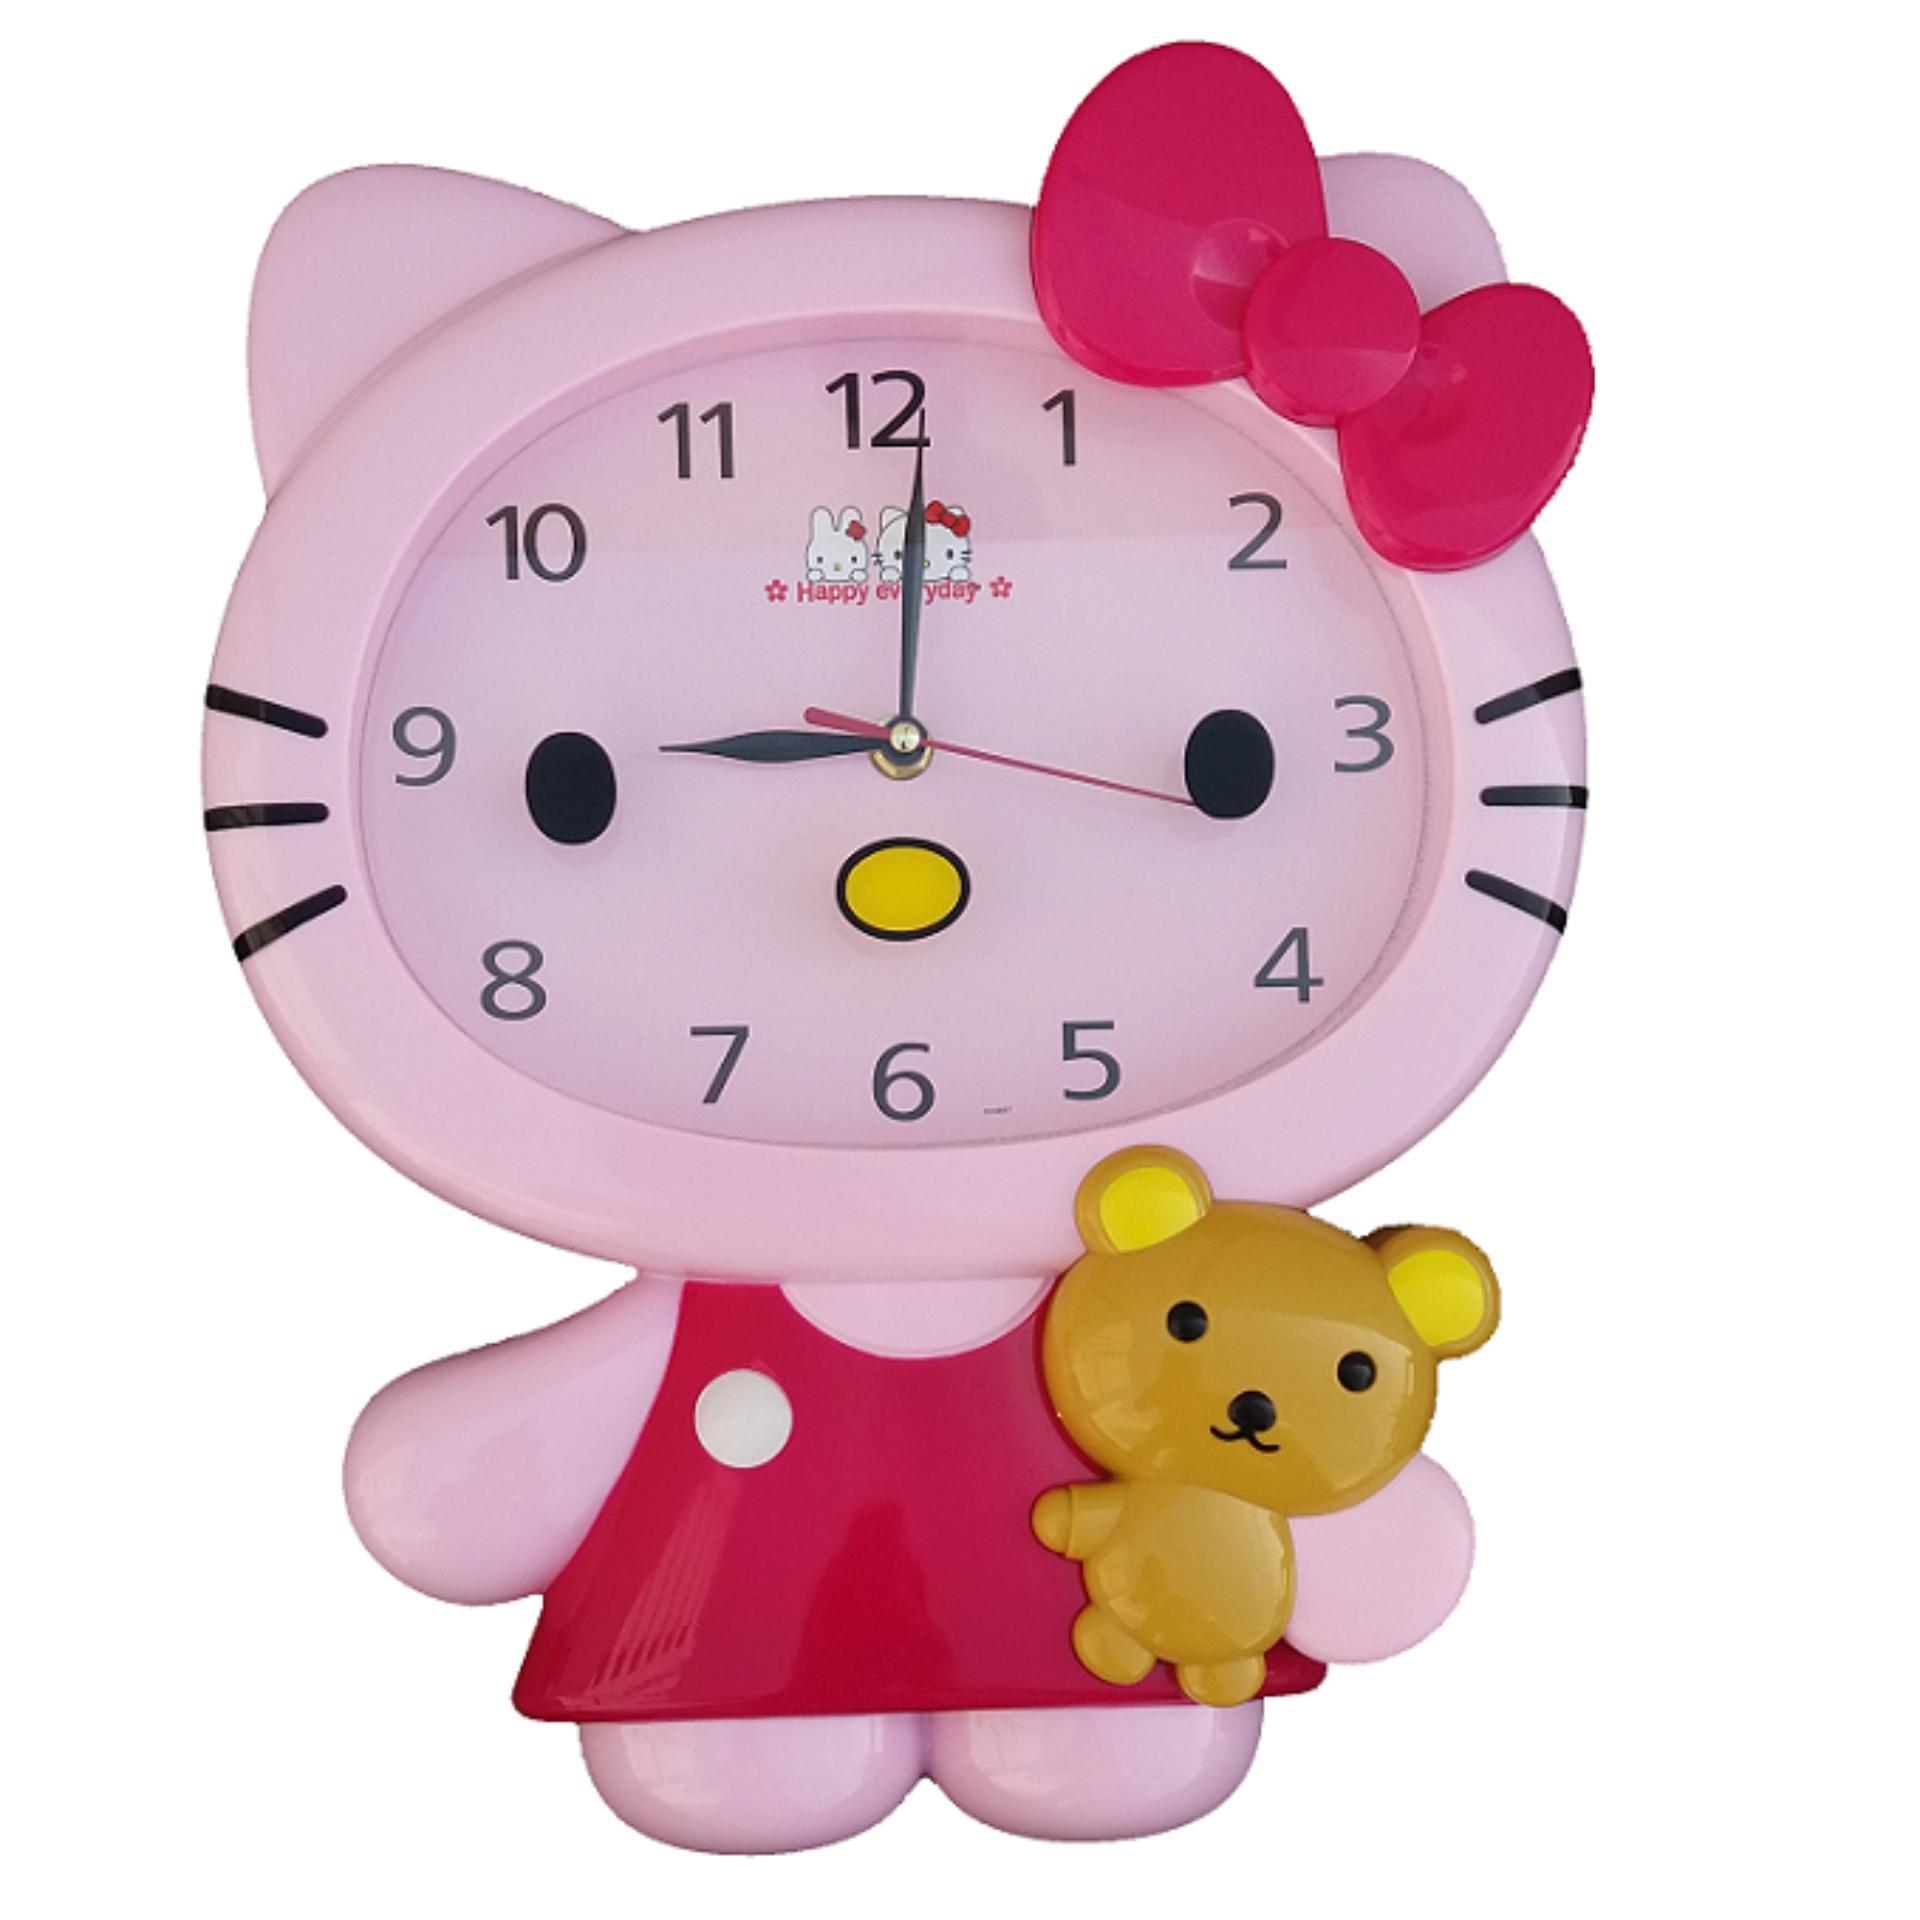 Mainan Aksesoris Hello Kitty Terlucu | Lazada